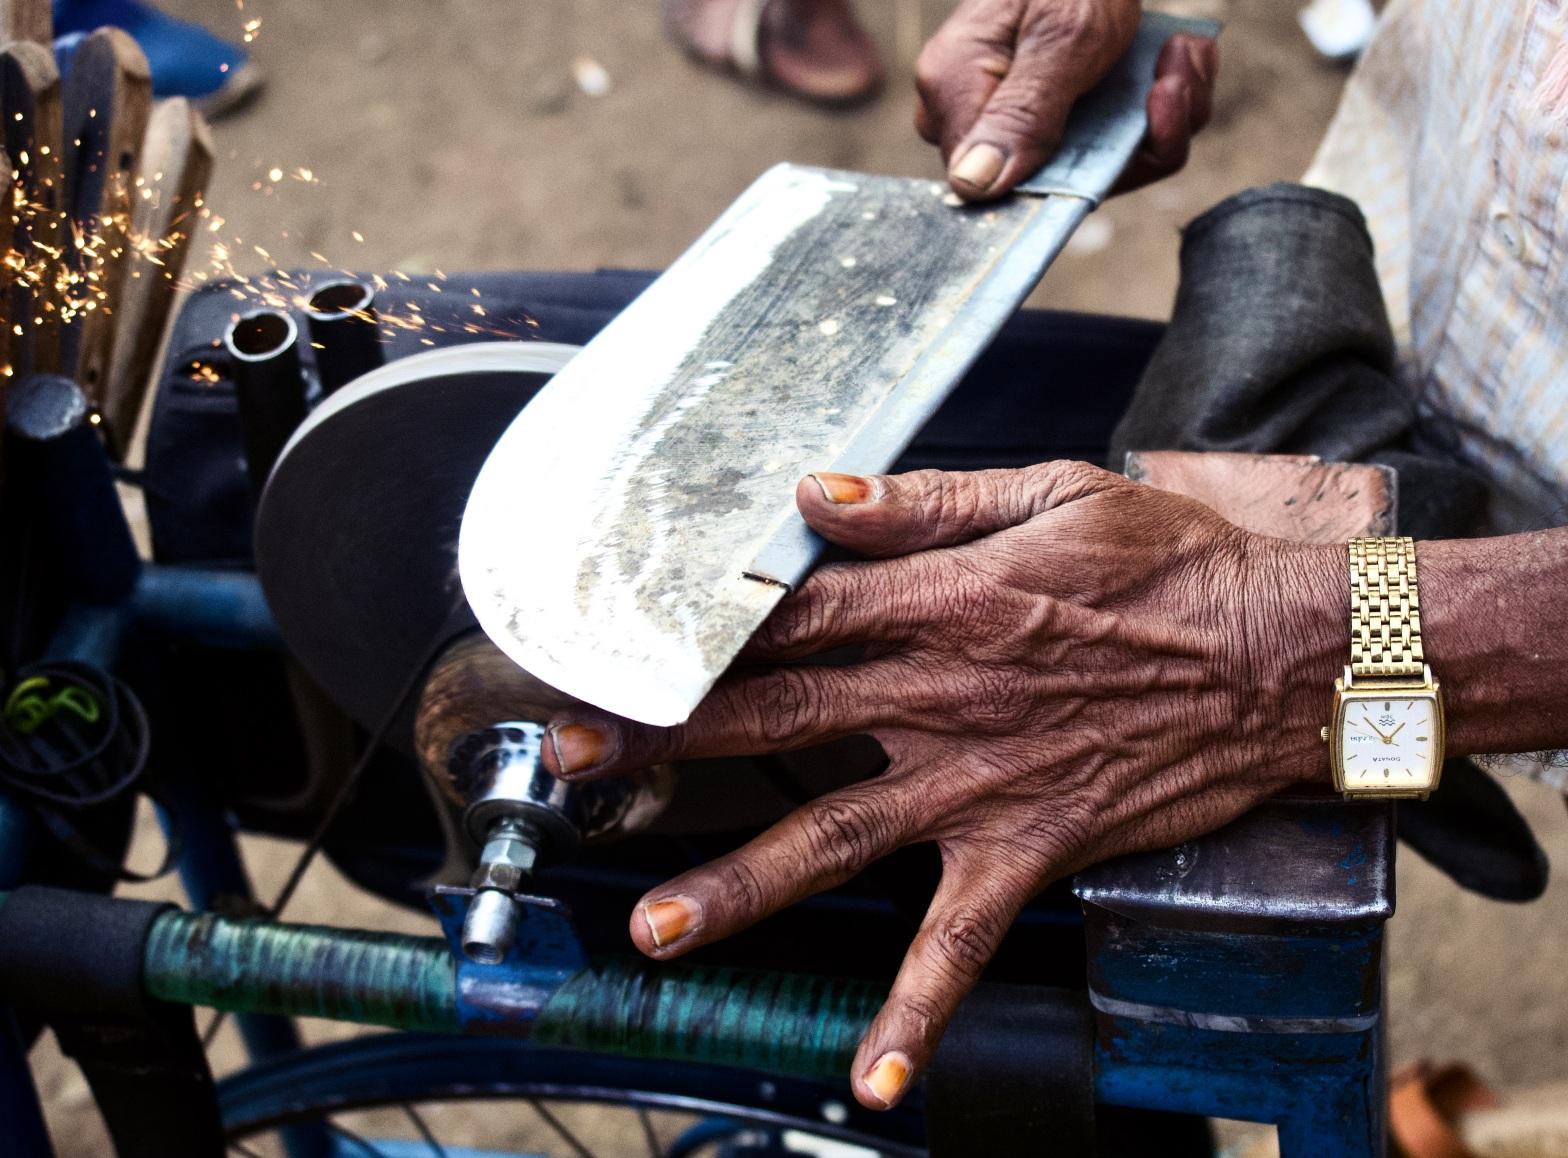 Wrinkled hands of a knife sharpener. Shot in Bangalore, Karnataka, India.